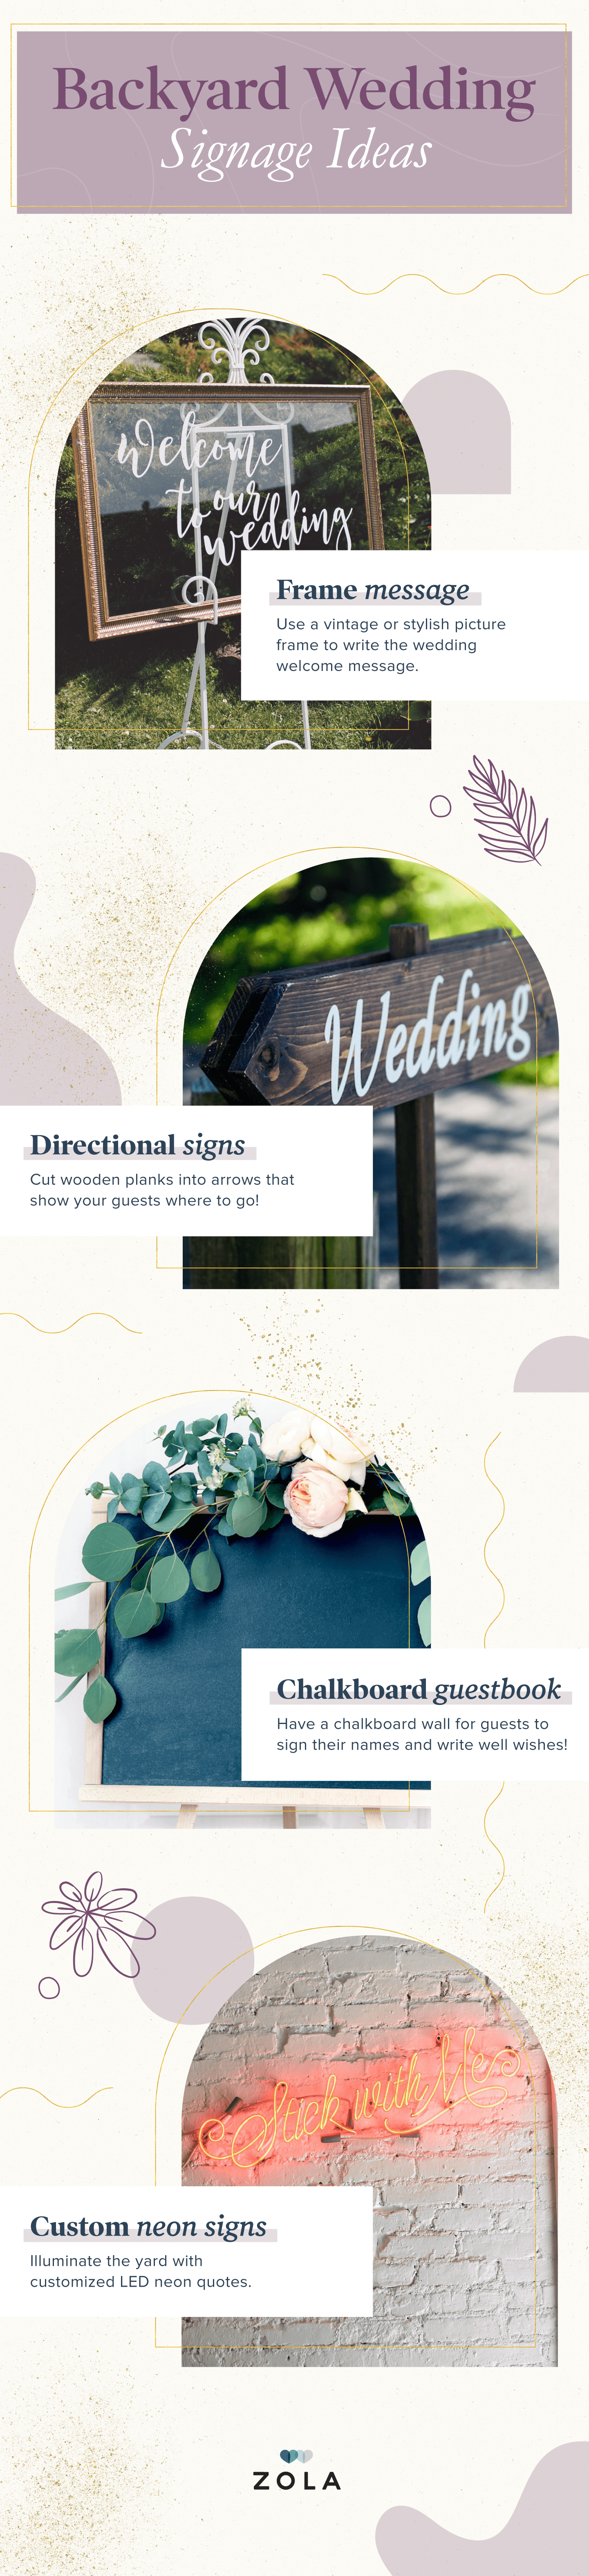 Backyard Wedding Ideas for the DIY Bride